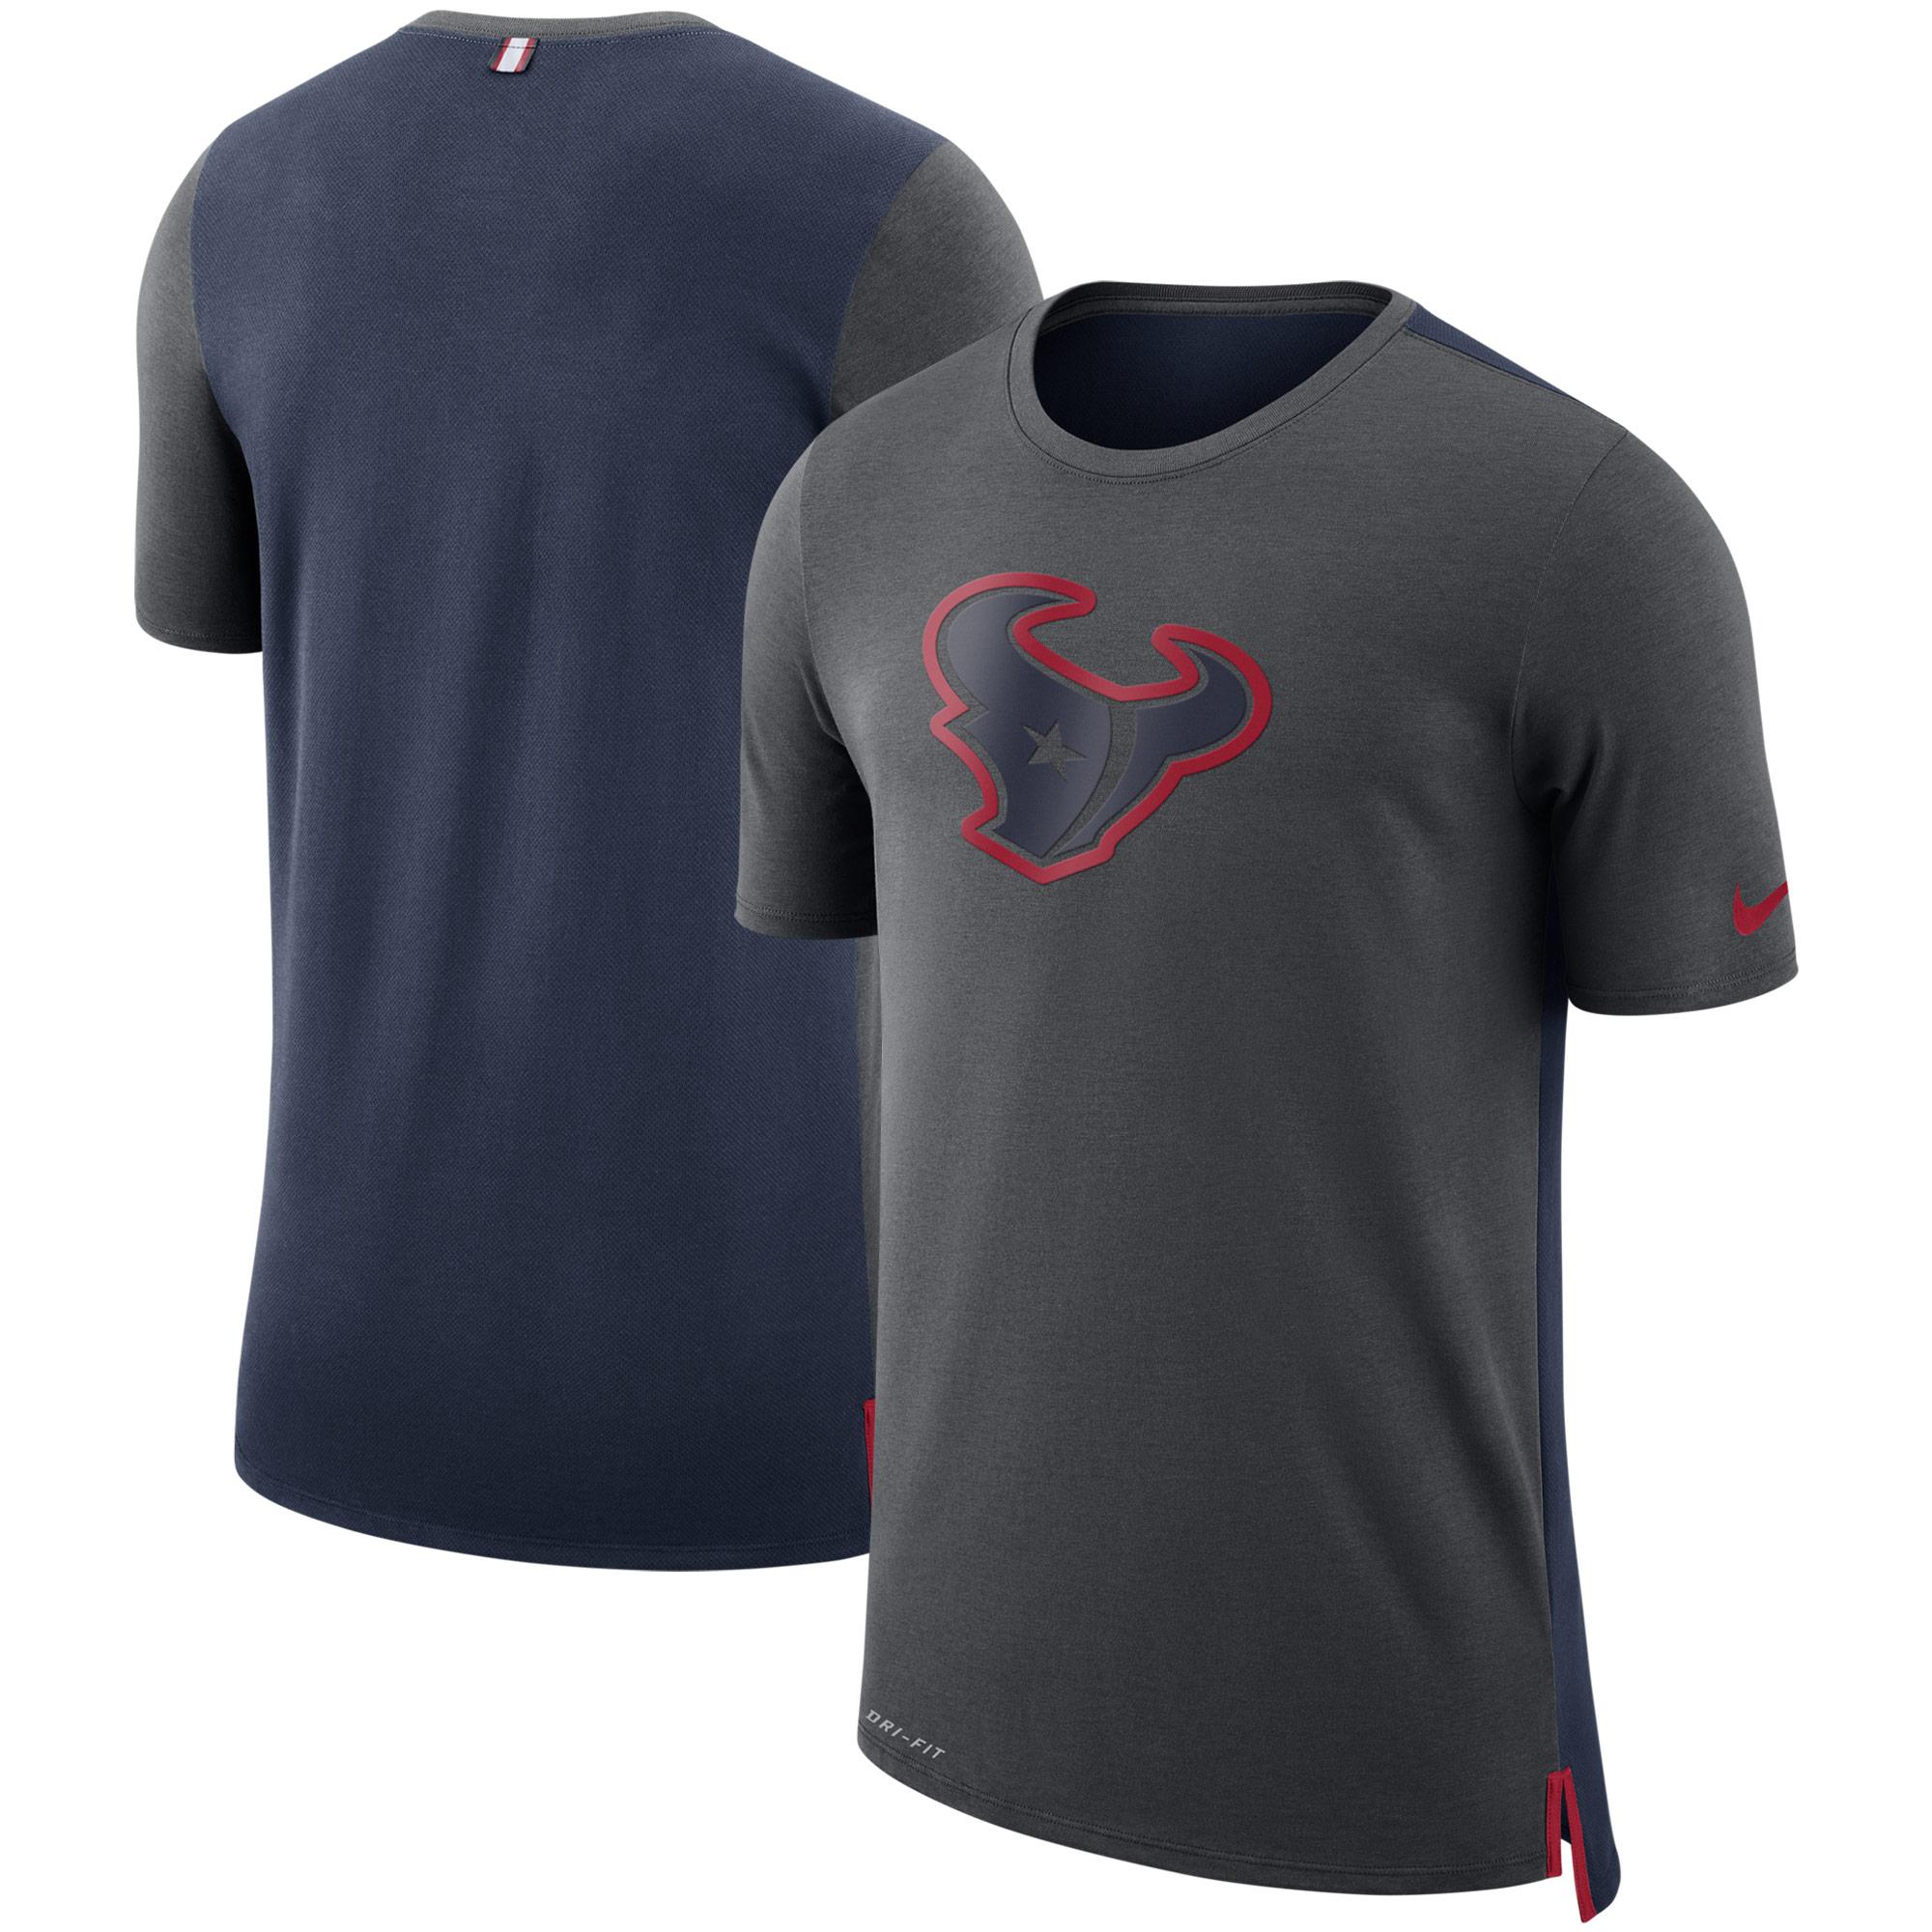 Houston Texans Nike Sideline Travel Mesh Performance T-Shirt - Charcoal/Navy